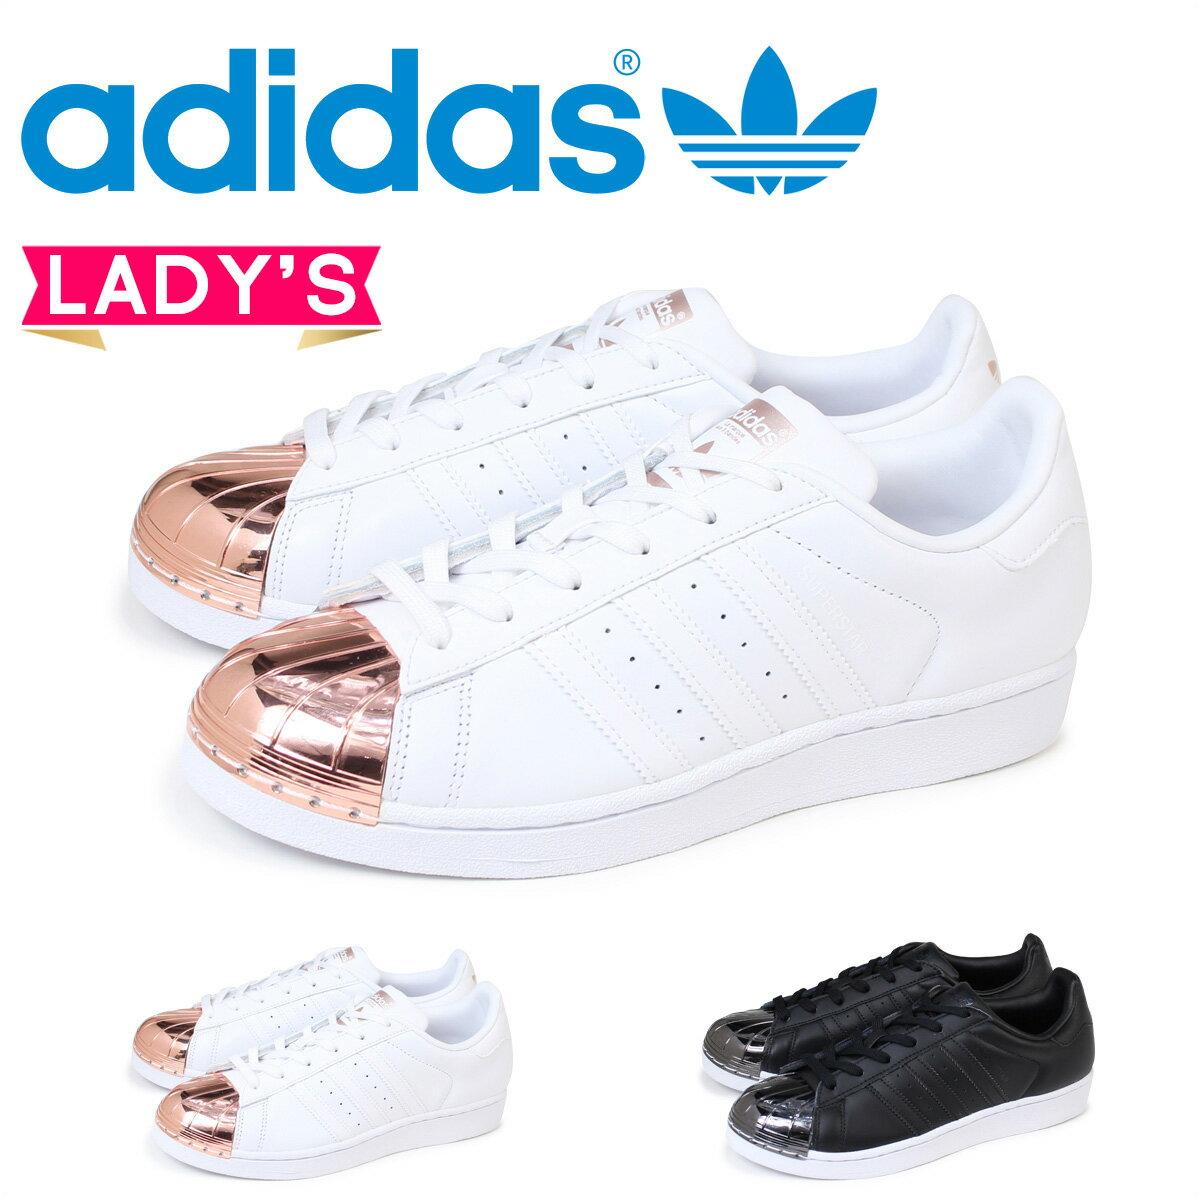 adidas Originals スーパースター レディース スニーカー アディダス オリジナルス SUPERSTAR METAL TOE W BY2882 BY2883 靴 ホワイト ブラック [171]